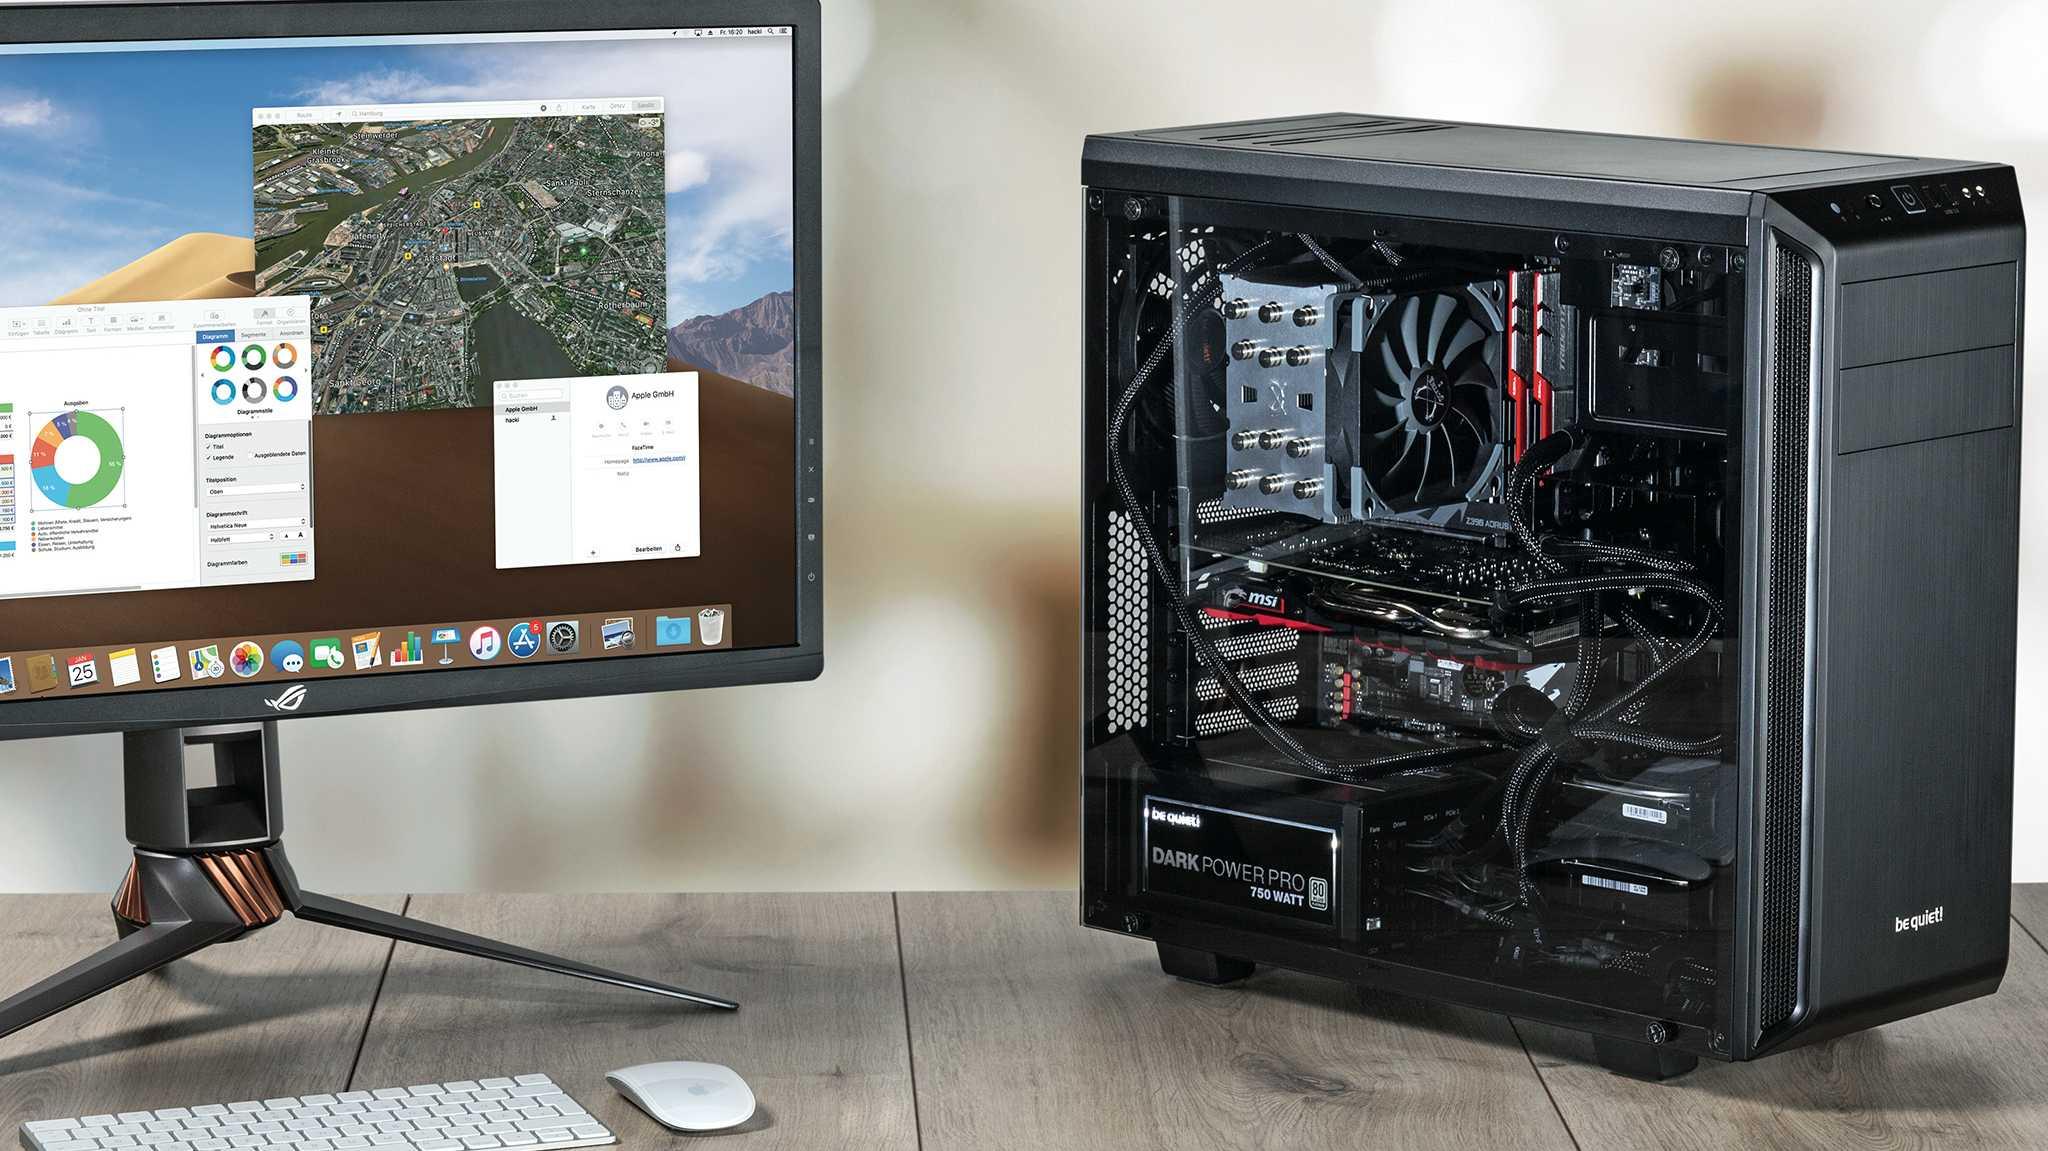 Hackintosh selbst bauen – statt teurem Mac